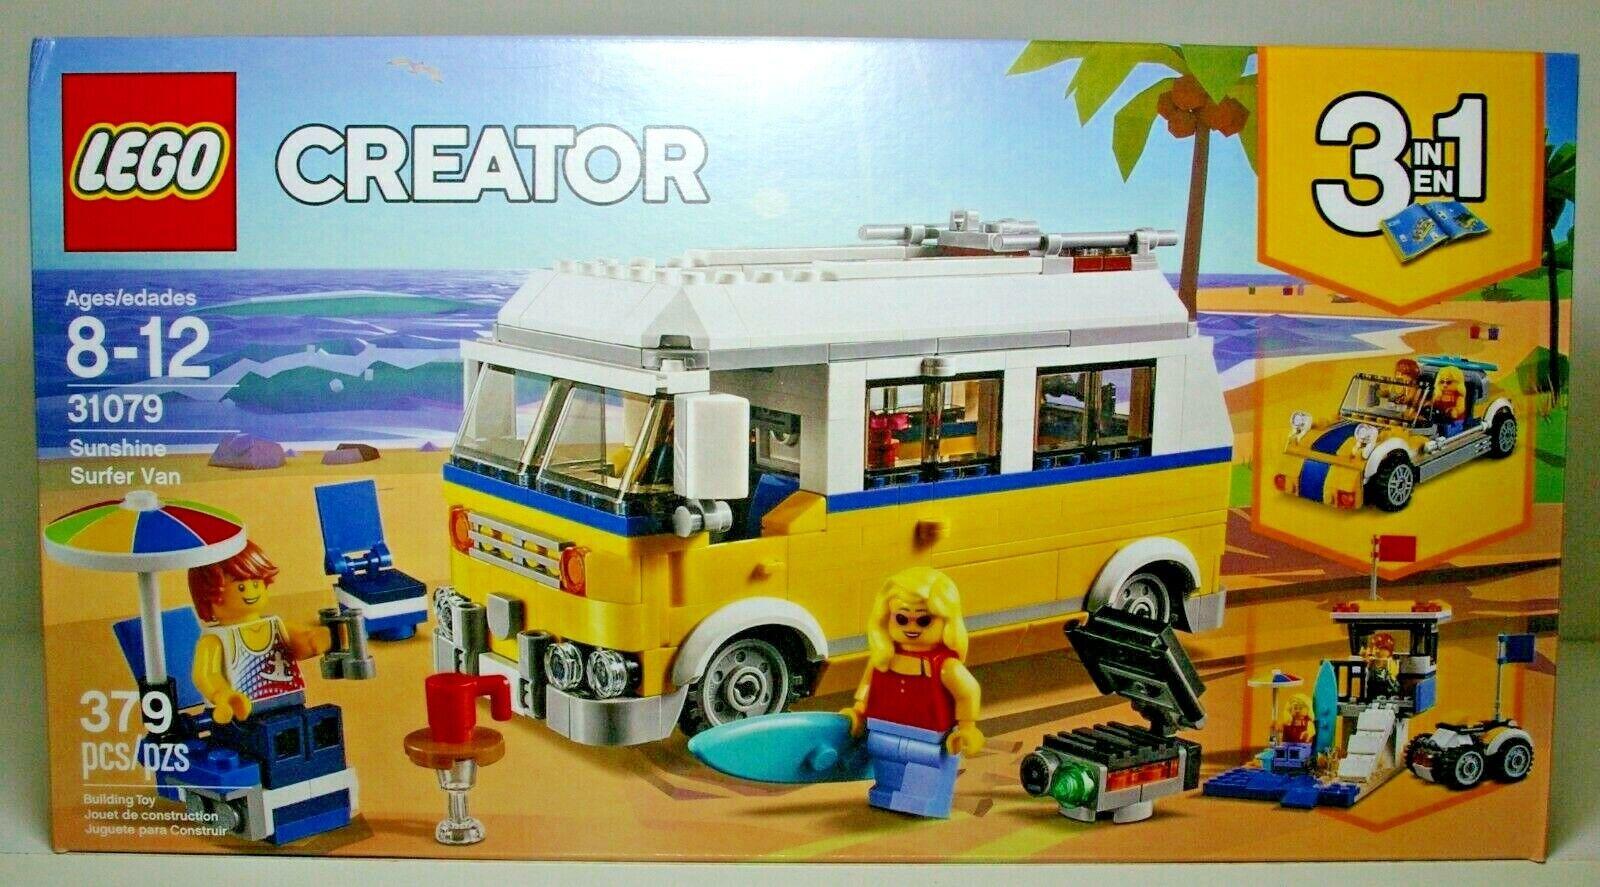 LEGO CREATOR 31079 SUNSHINE SURFER VAN 2018 MIP